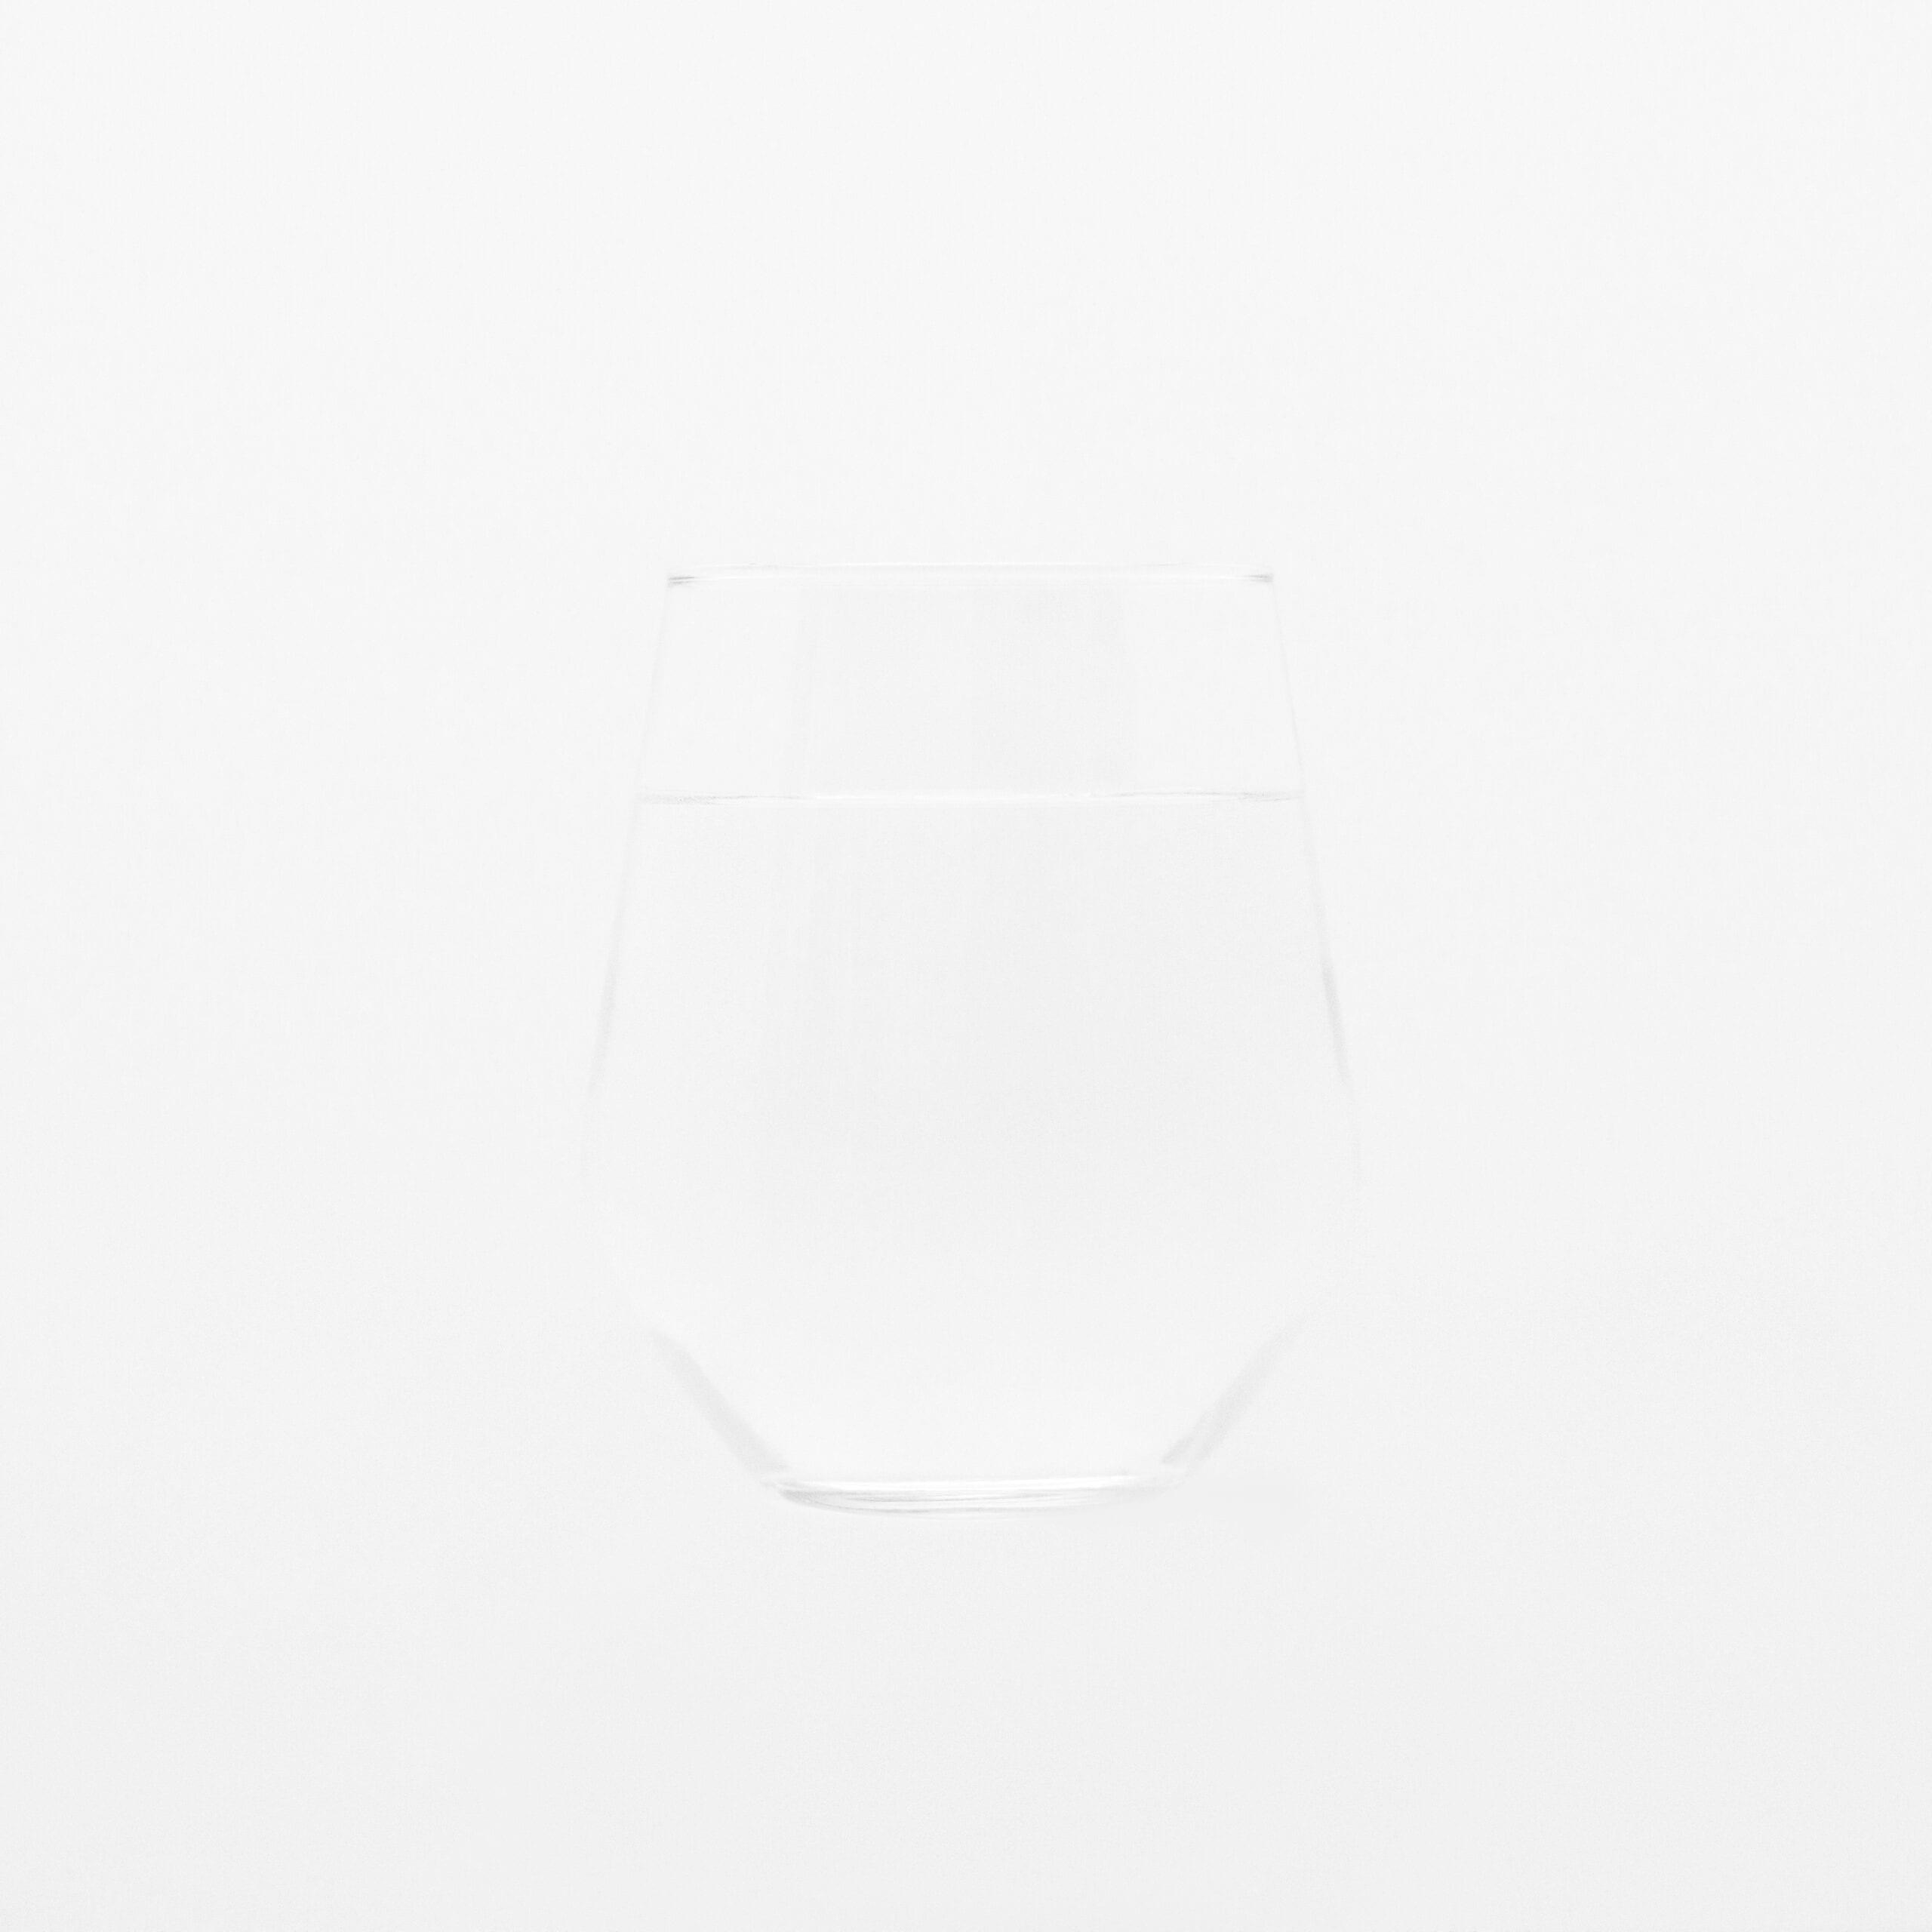 Darkness cup IG 3